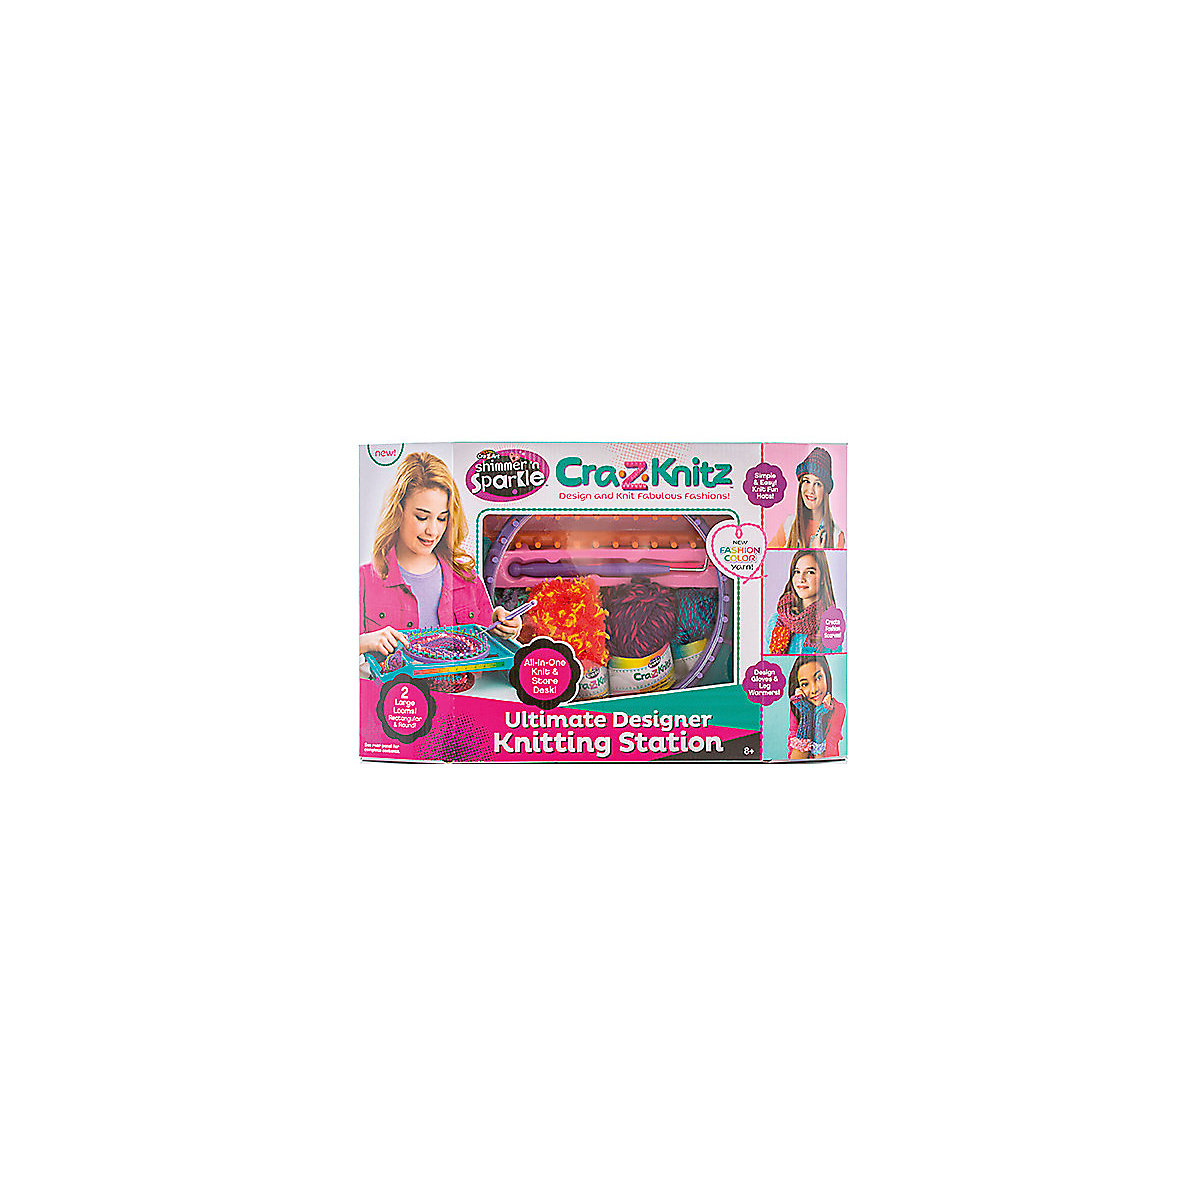 Cra-Z-Knitz Craft Toys 5103463 For Children Kits For Creativity Boy Girl Play Game Development MTpromo